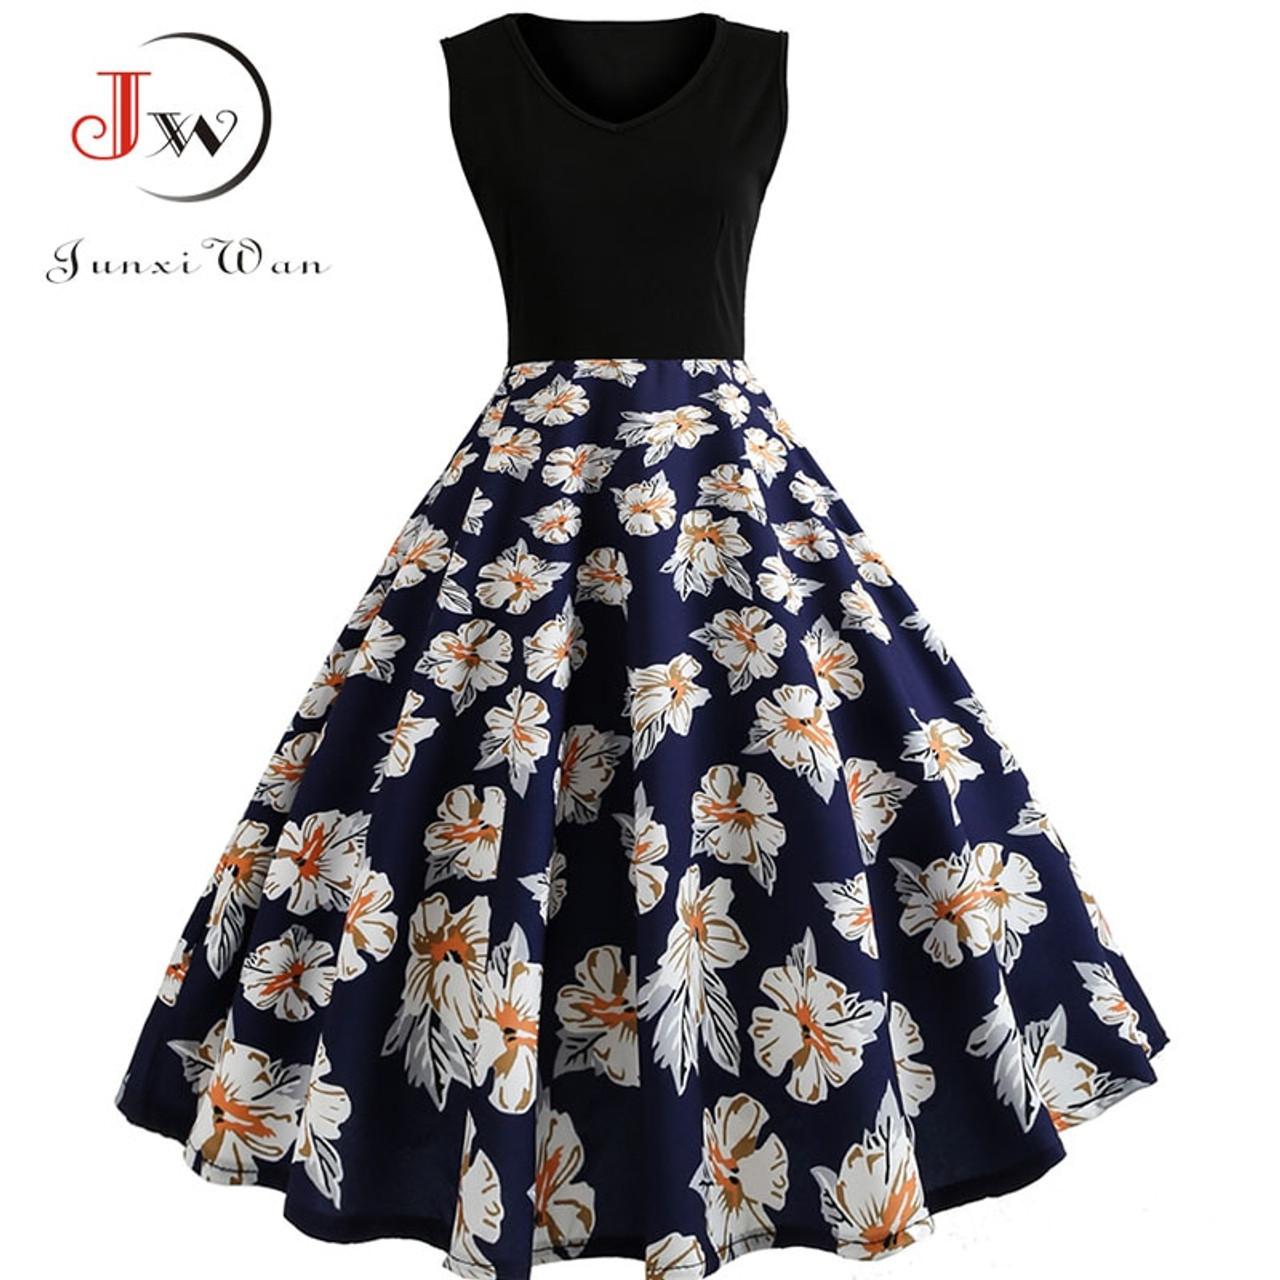 ... V Neck Sexy 2018 Summer Dress Women Floral Print Patchwork Vintage  Dress Hepburn 50s Elegant Party ... 32b8f1bc4458